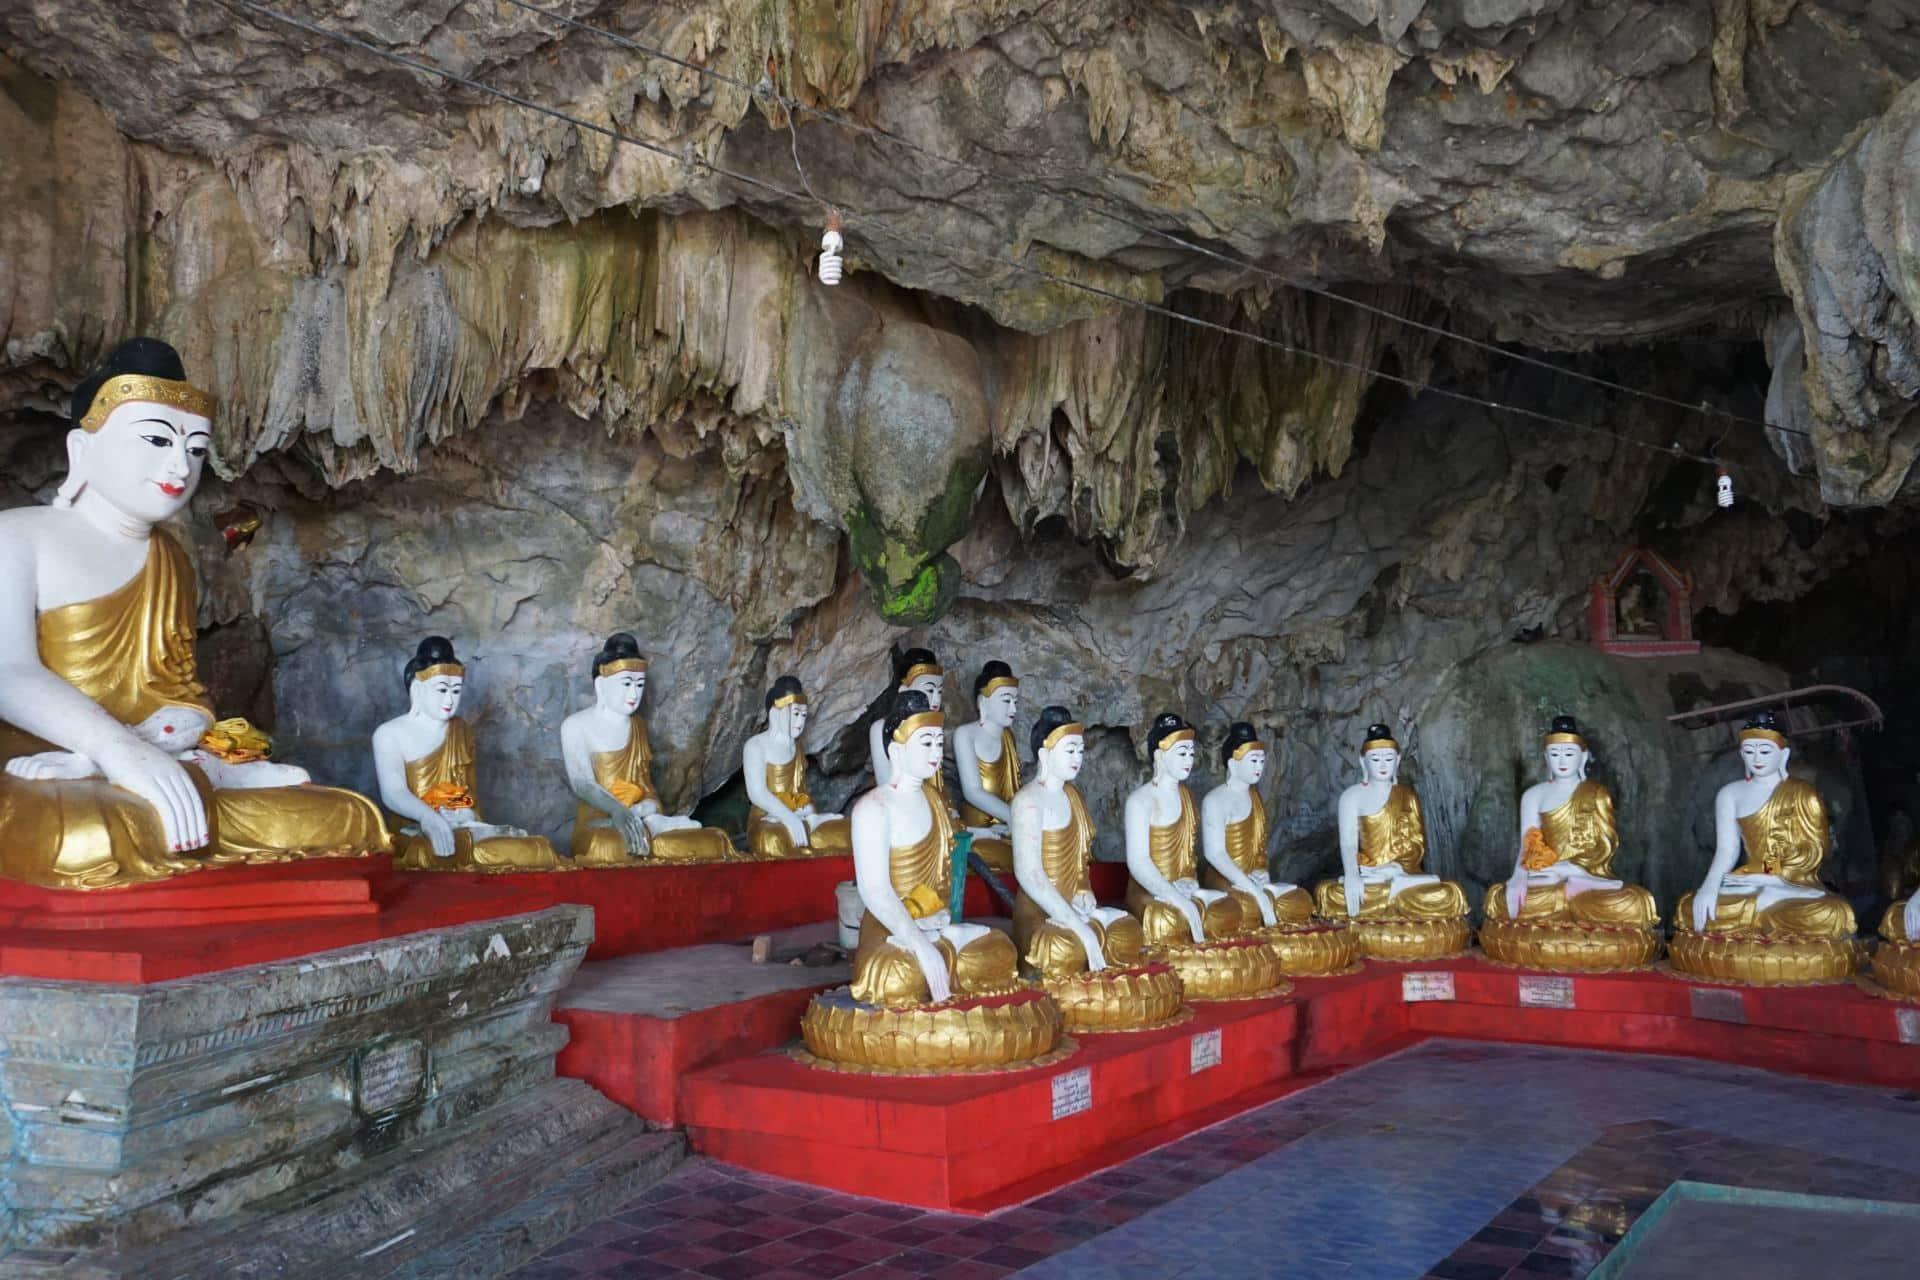 Bayin Nyi Cave- Hpa-An Höhle